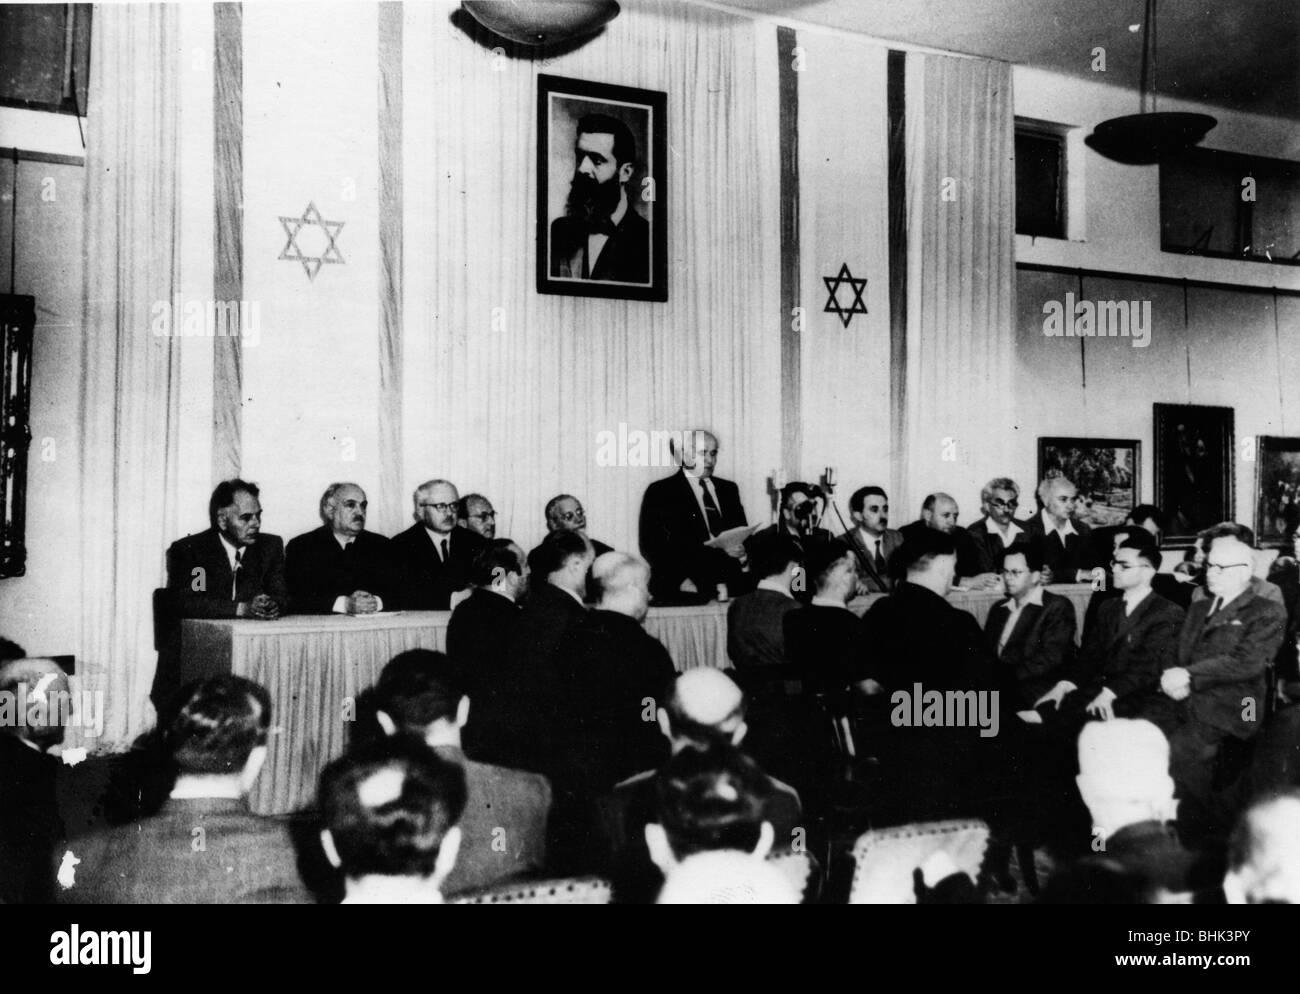 David Ben Gurion (1886-1973) proclaims the independent Jewish state, 1948. - Stock Image